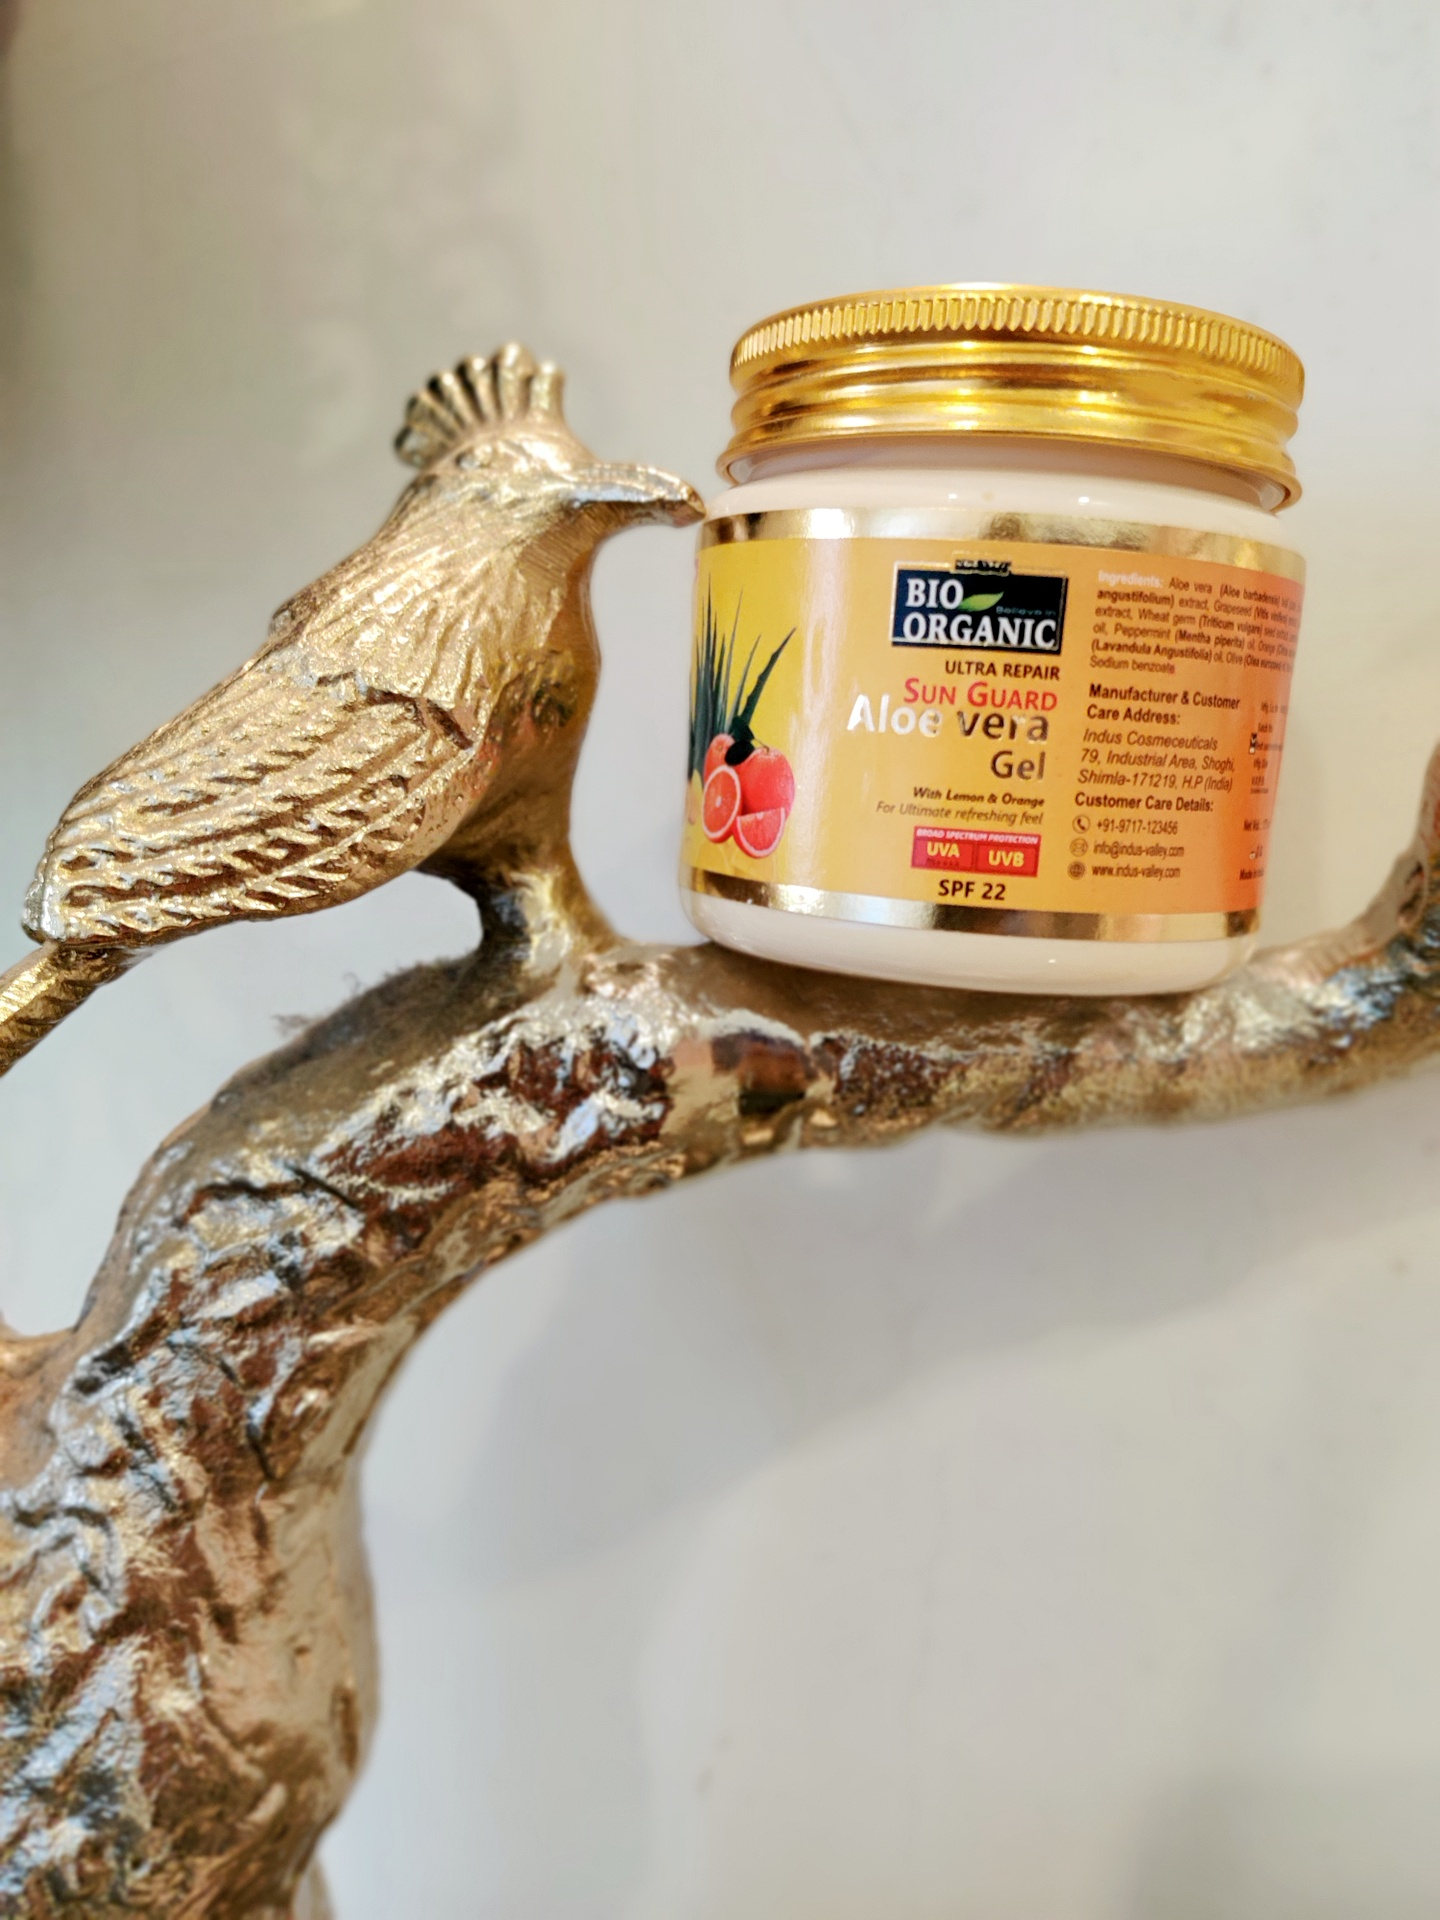 Indus Valley Bio Organic Sun Guard Aloe Vera Gel With Lemon & Orange-SPF 22-Sun Protection with Aloe Vera-By sonam_jaggi